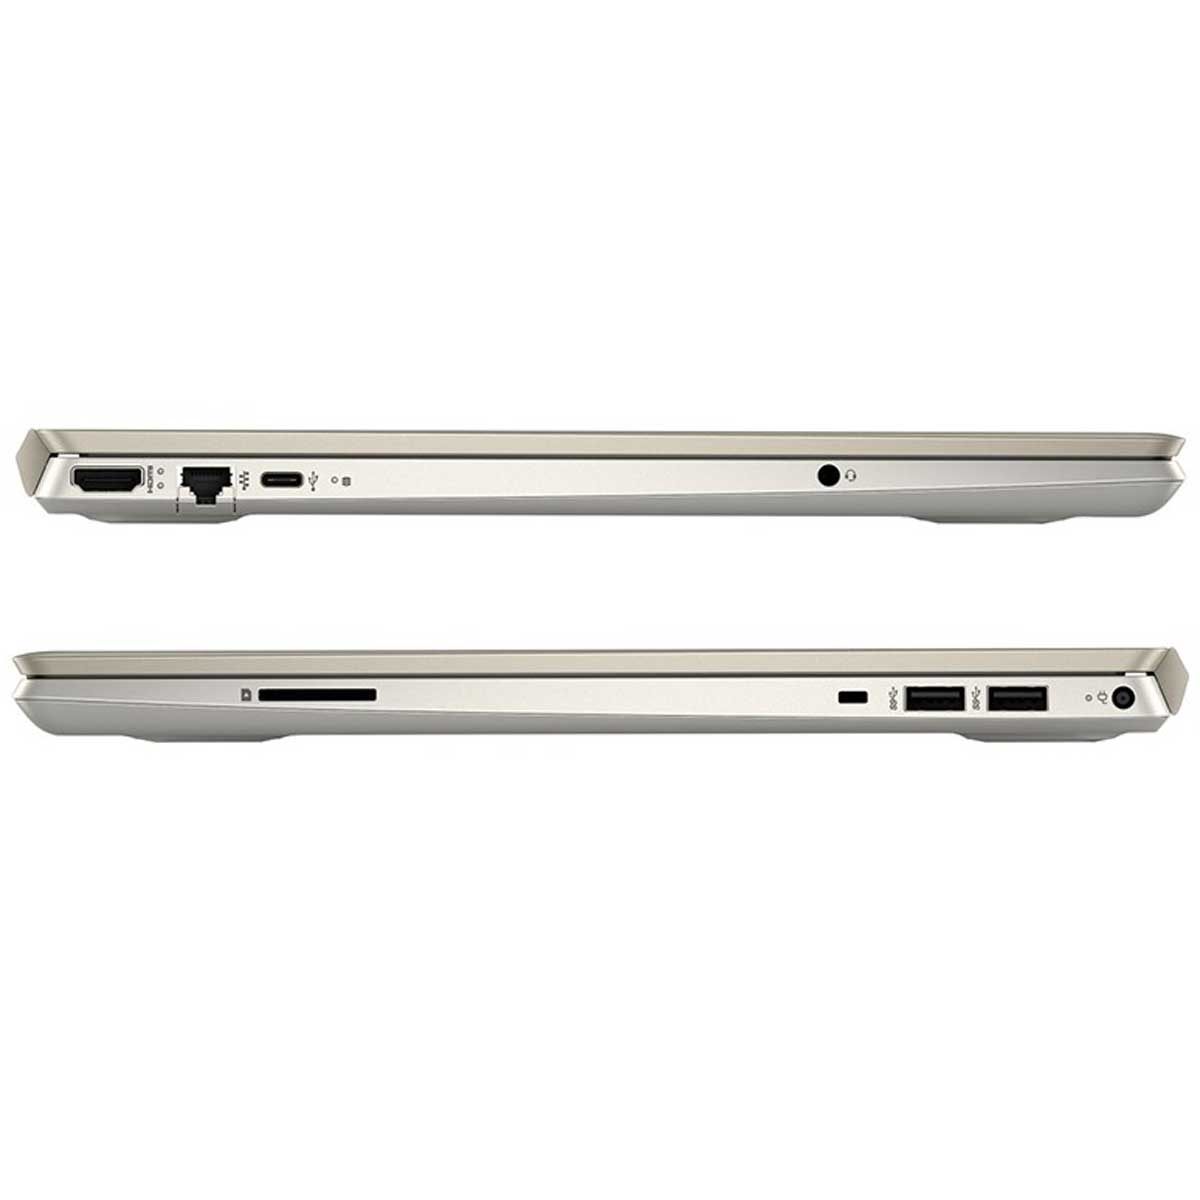 Laptop HP Pavilion 15-cs3012TU Core i5-1035G1 (8QP30PA)